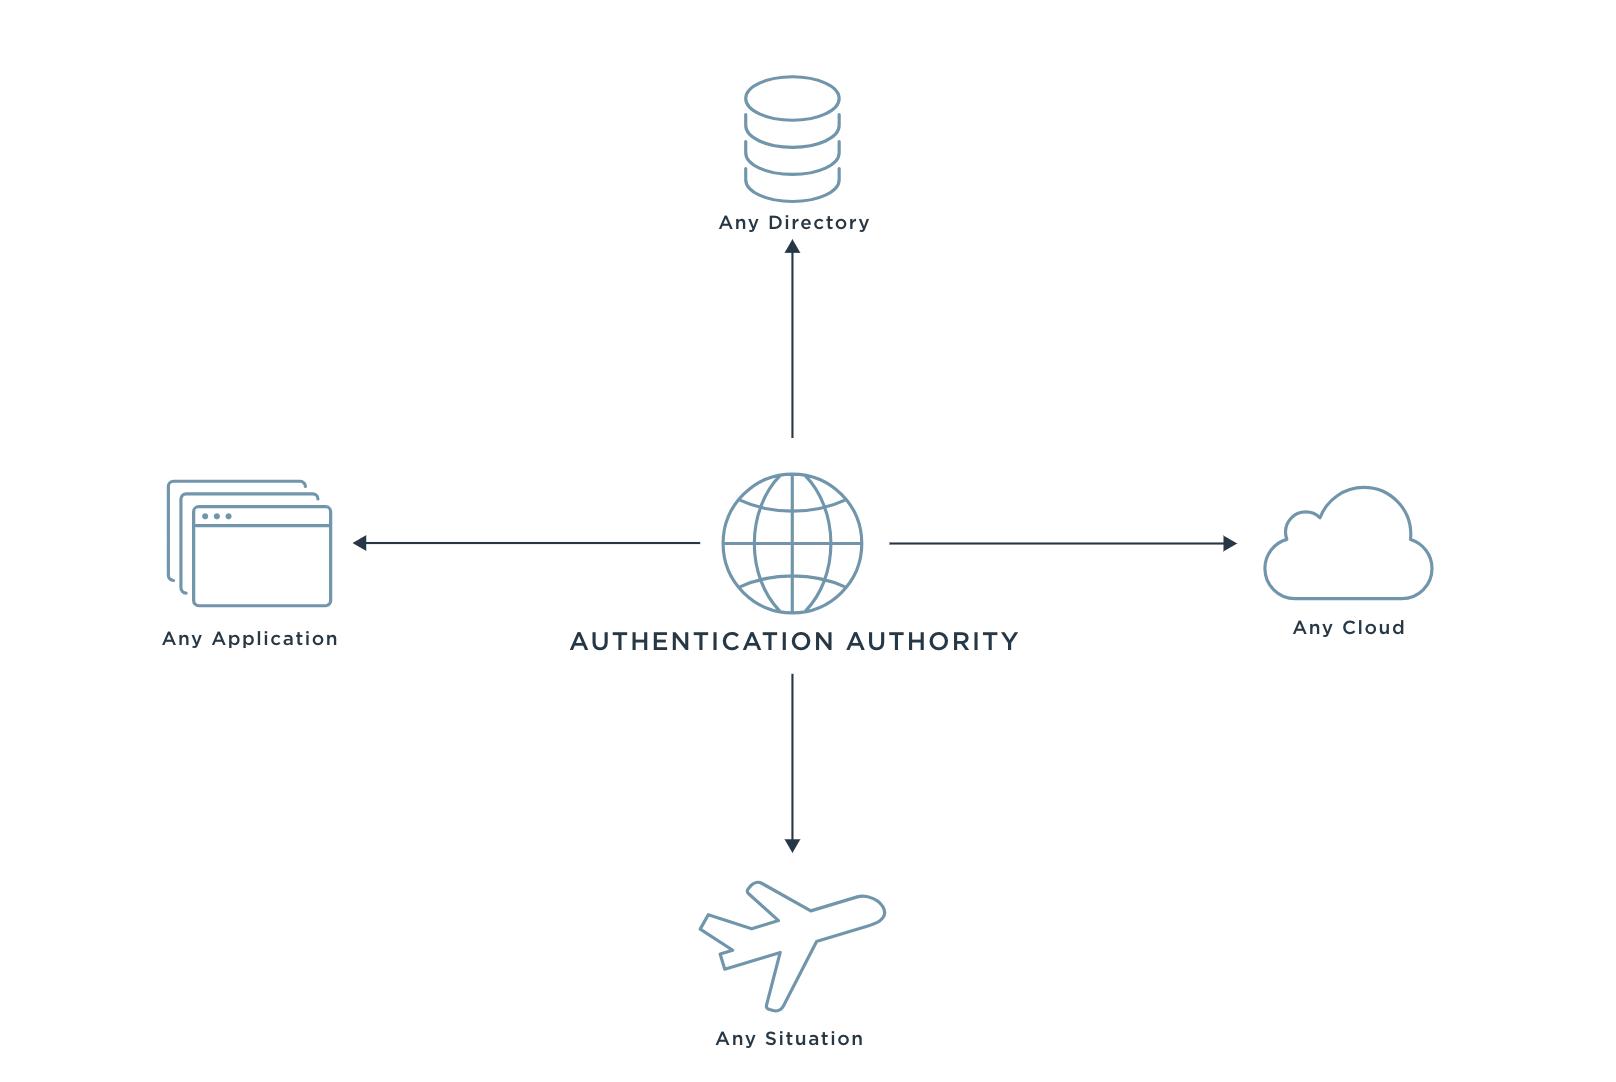 Ping Identity Authentication Authority Graphic Zero Trust Blog 2021